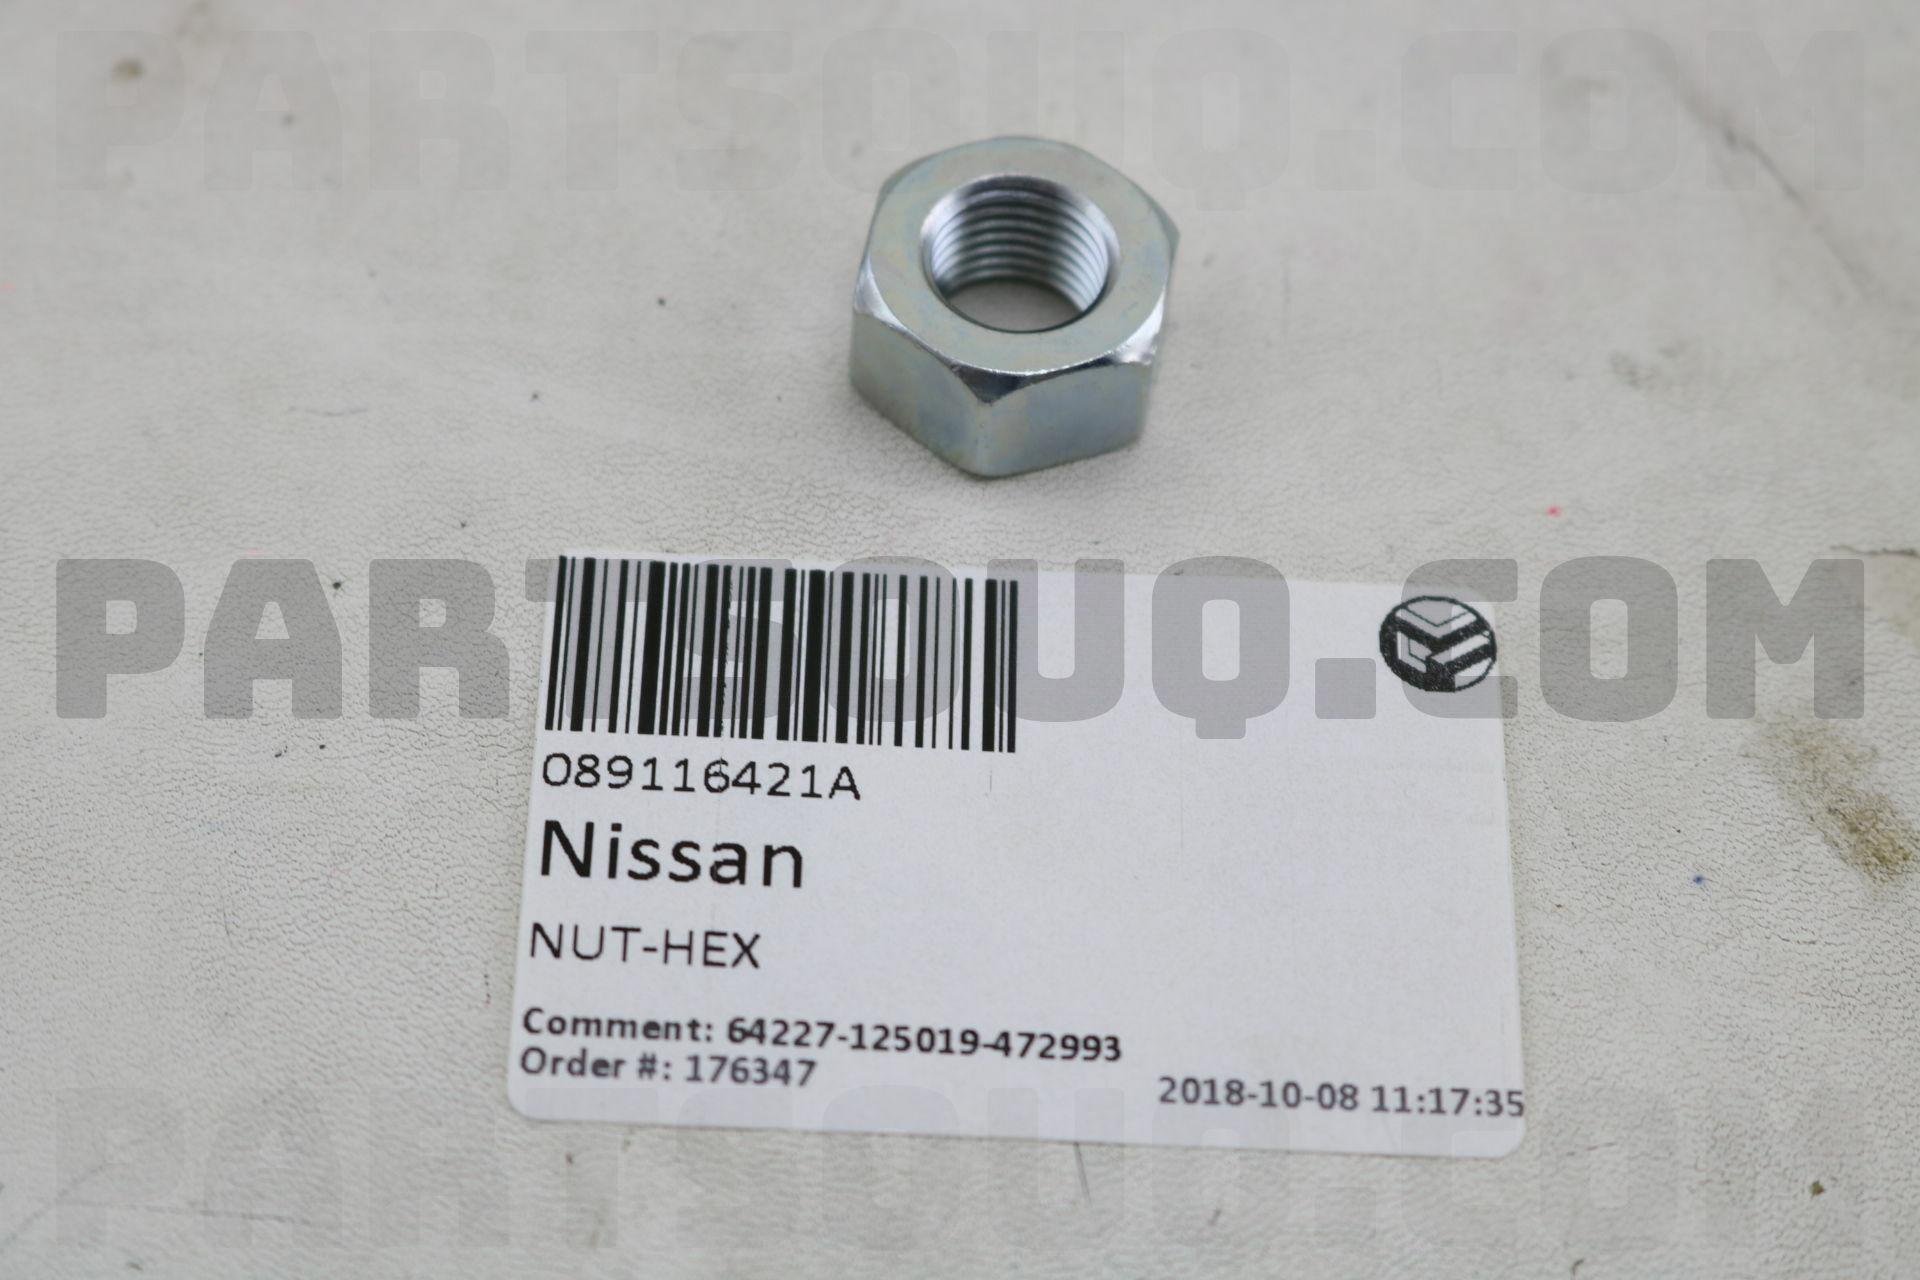 089116421A Nissan NUT-HEX Price: 0 9$, Weight: 0 02kg - PartSouq